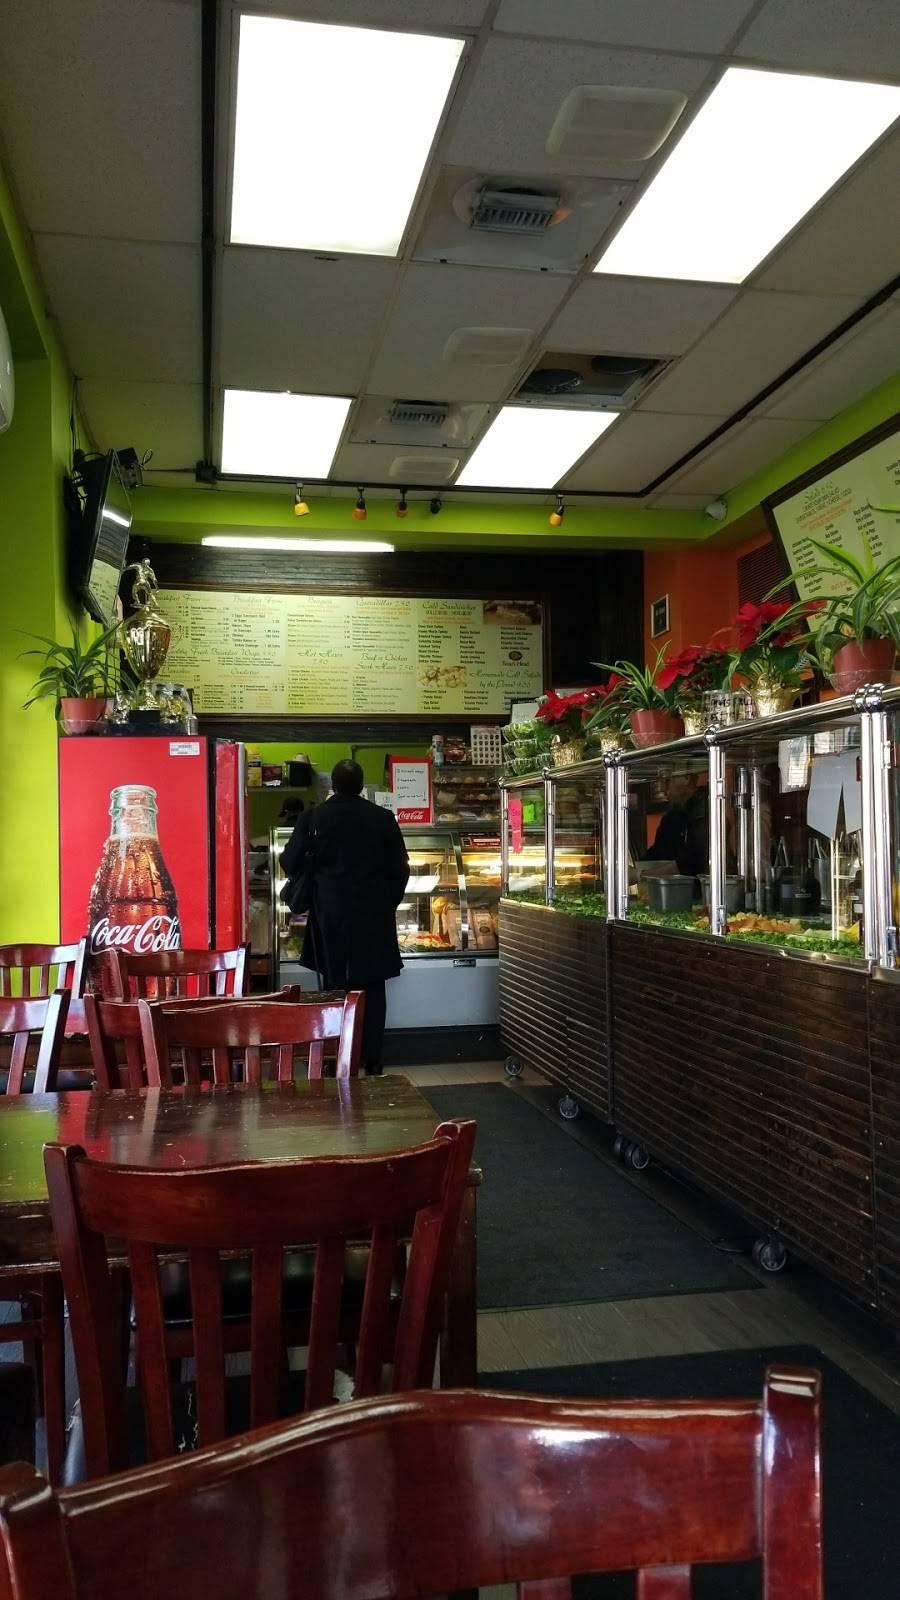 Healthy Fresh, inc. | restaurant | 621 E 187th St, Bronx, NY 10458, USA | 7186187200 OR +1 718-618-7200